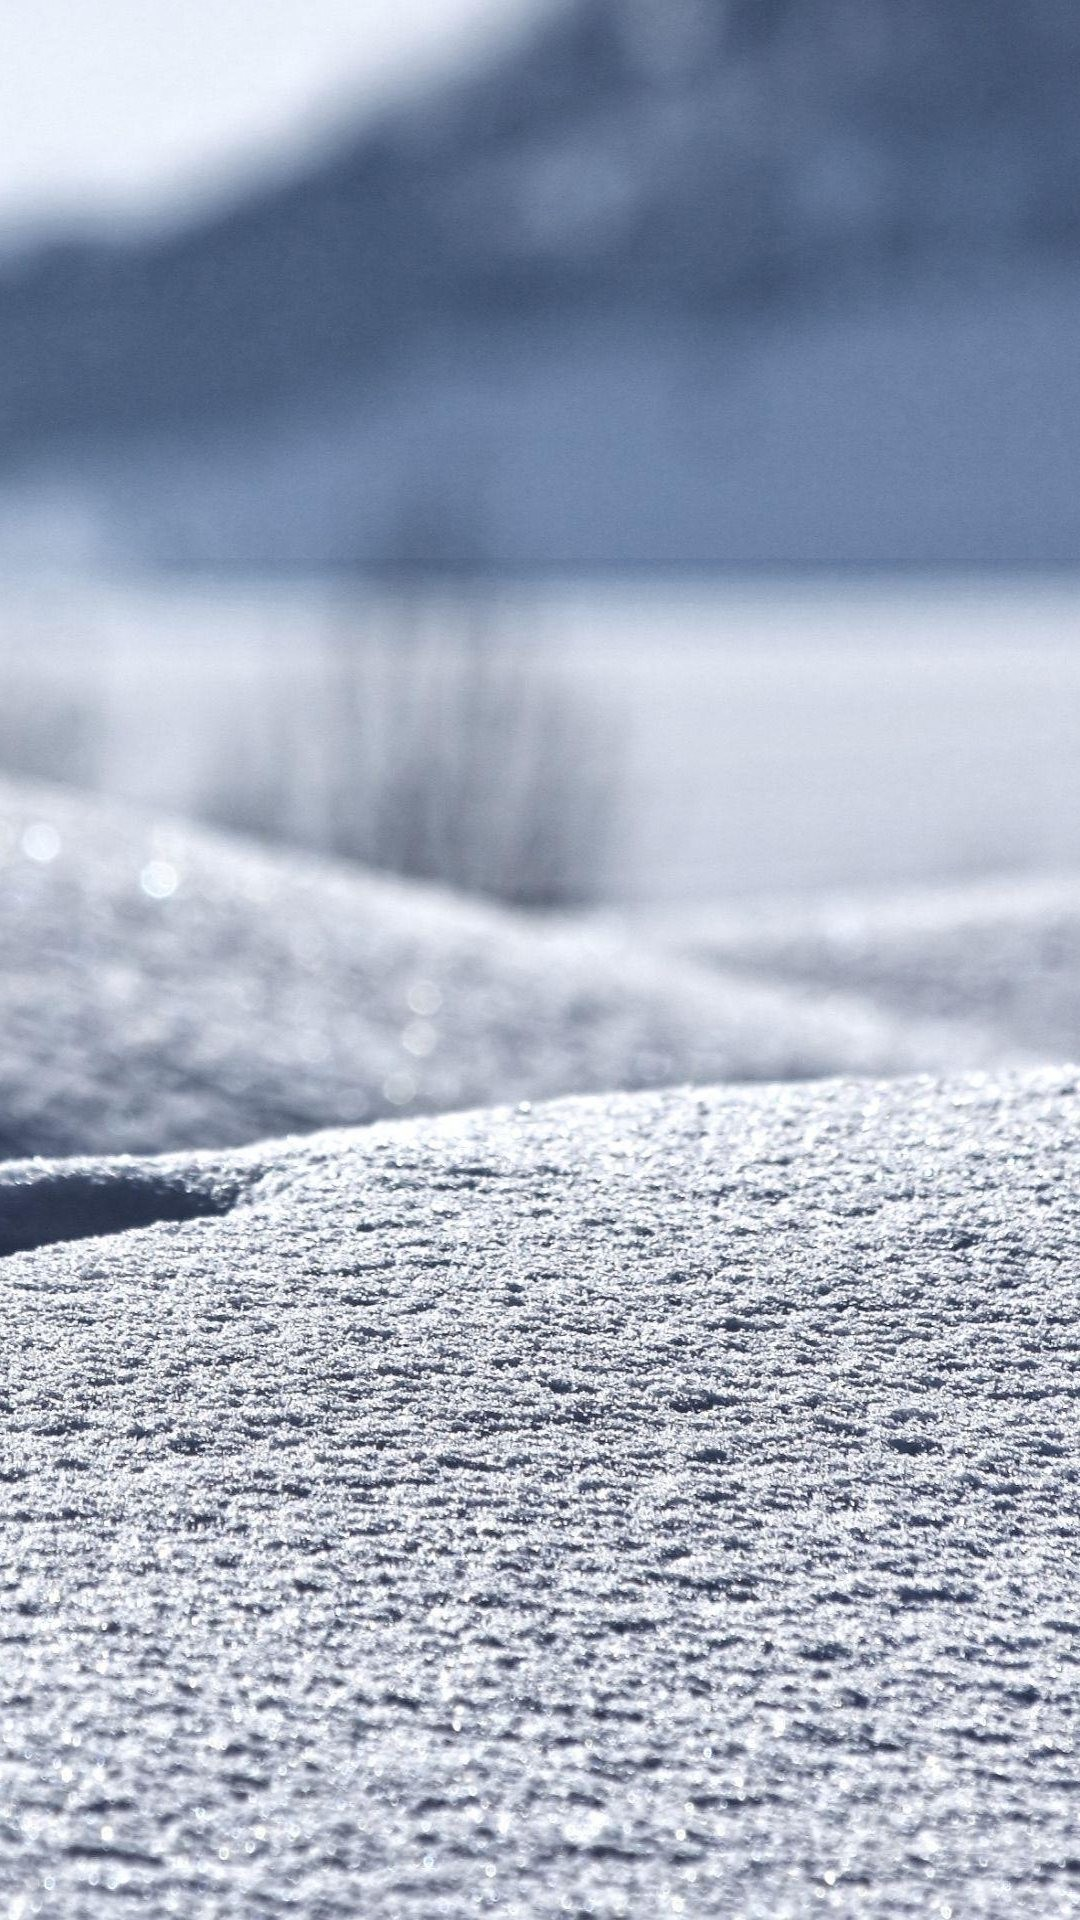 Winter In My Backyard iPhone 6 Plus HD Wallpaper …